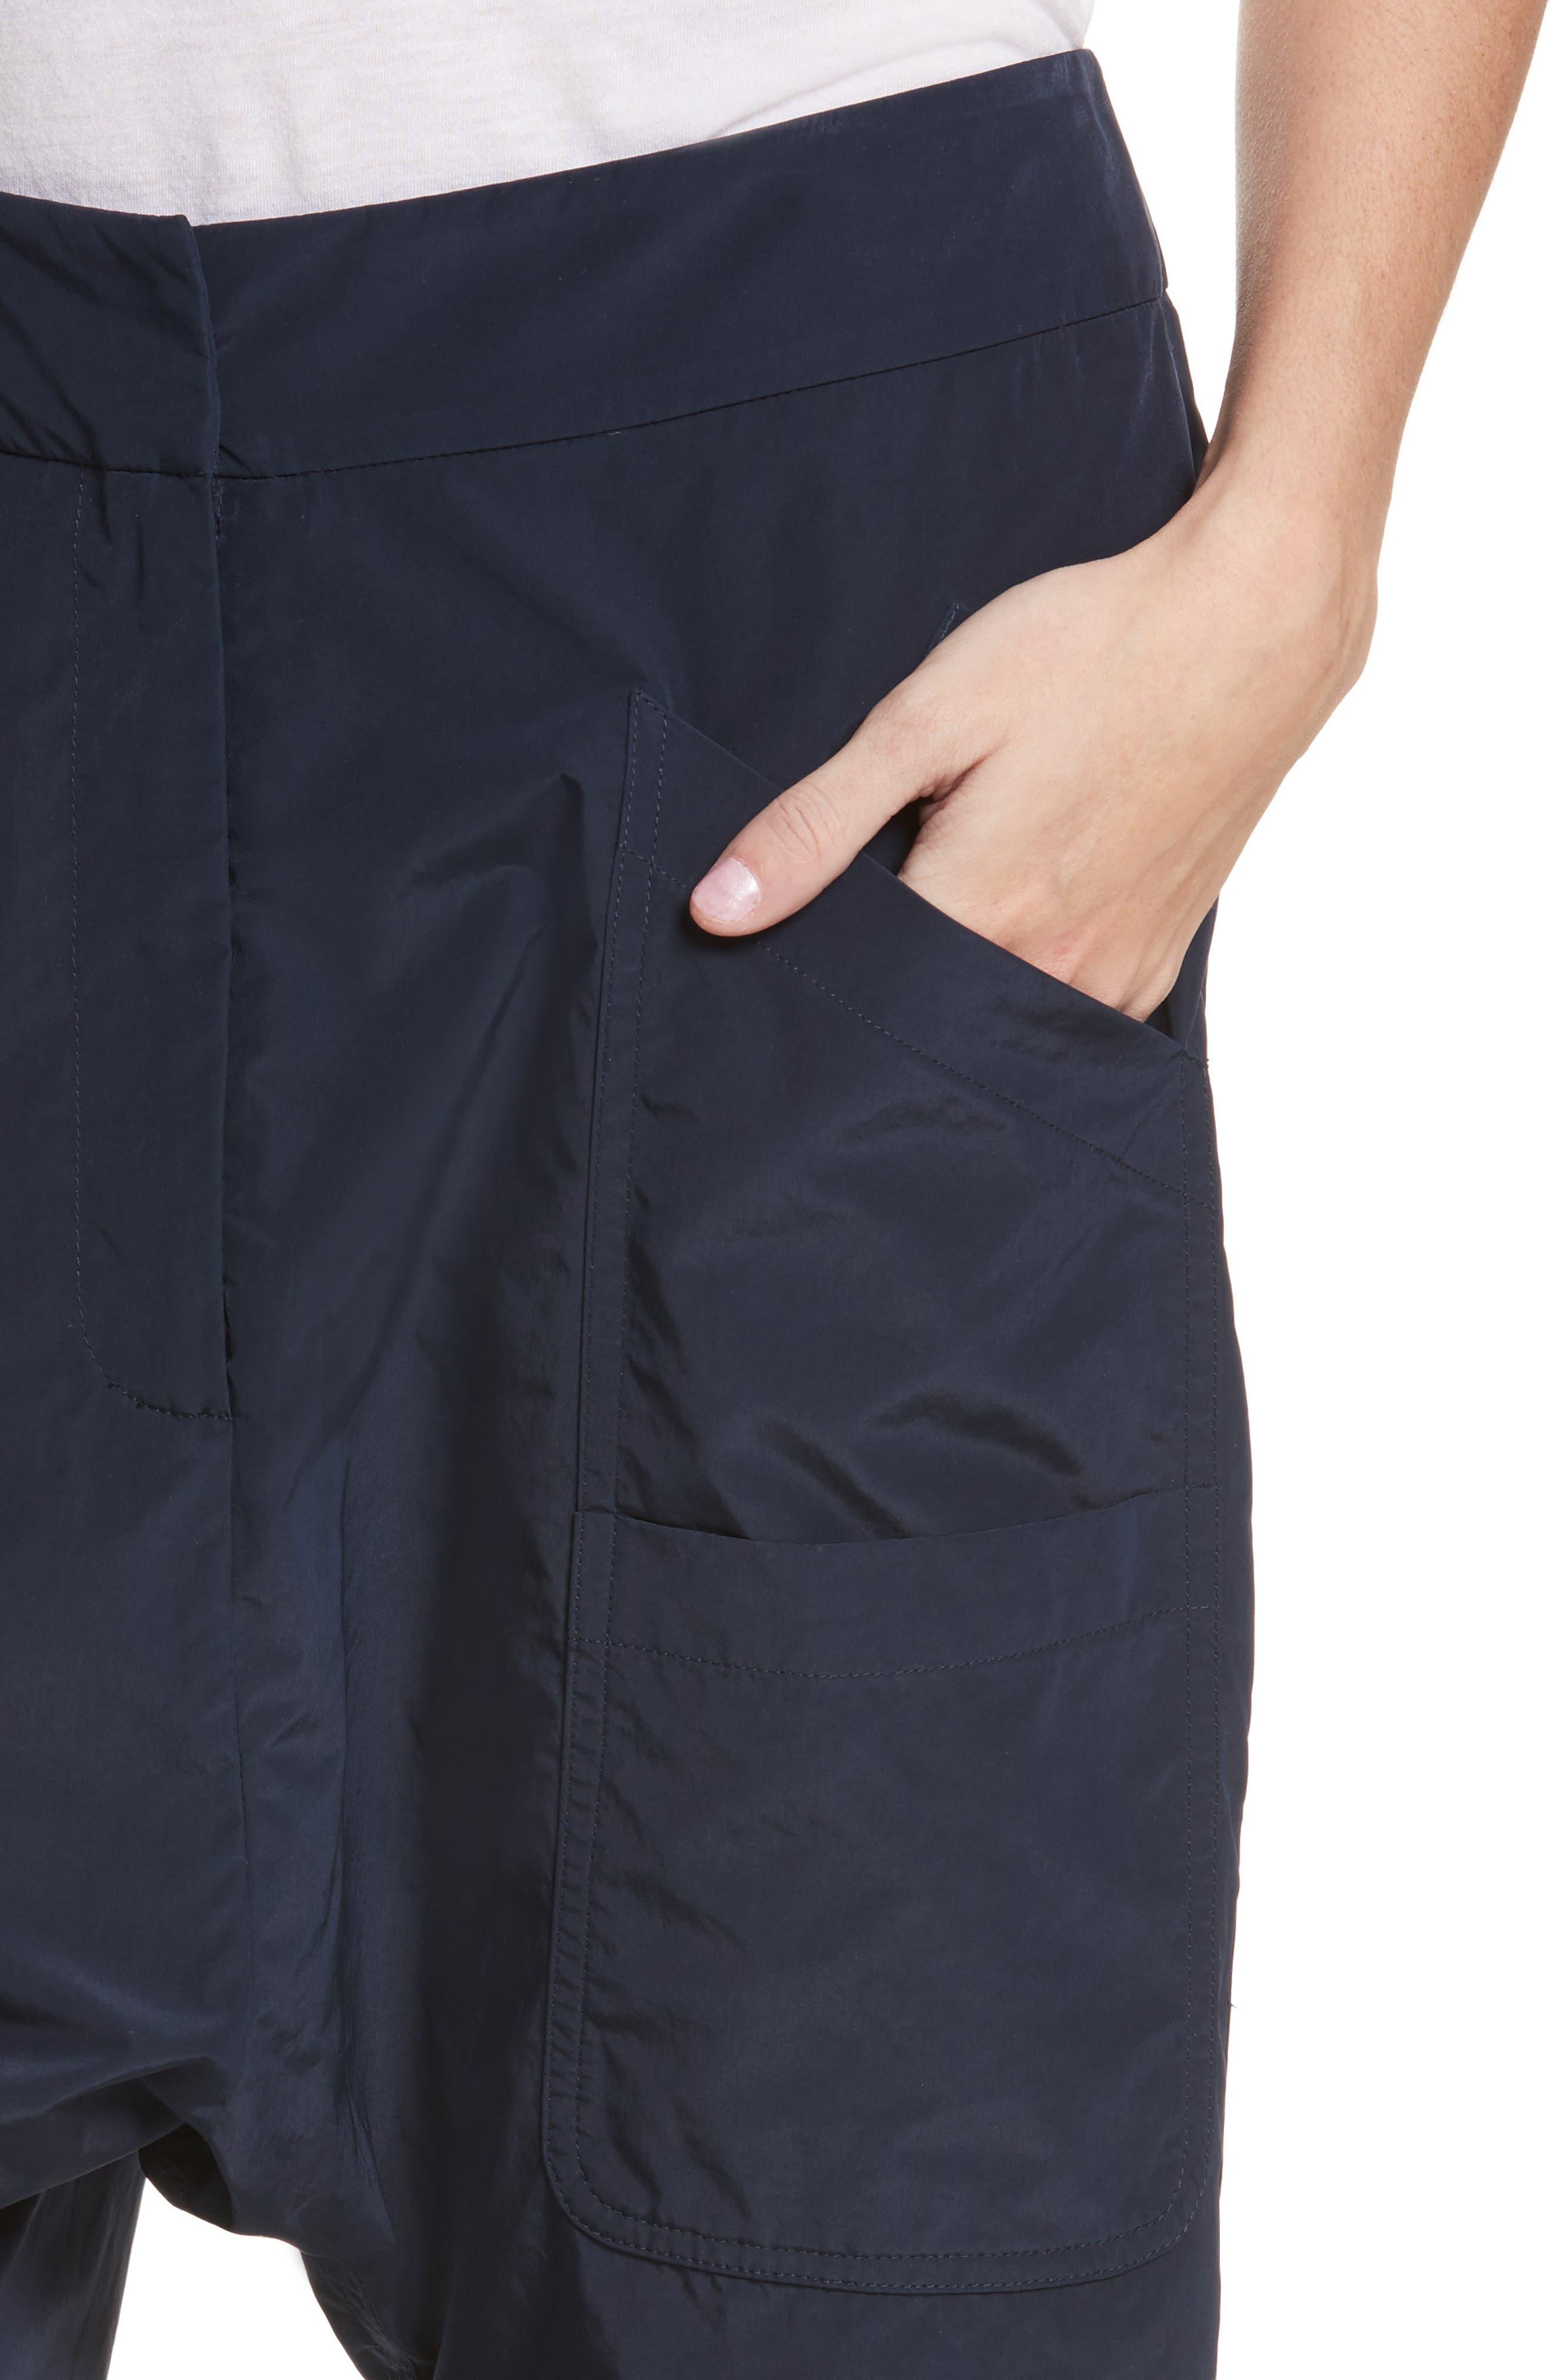 Drop Crotch Shorts,                             Alternate thumbnail 4, color,                             Navy